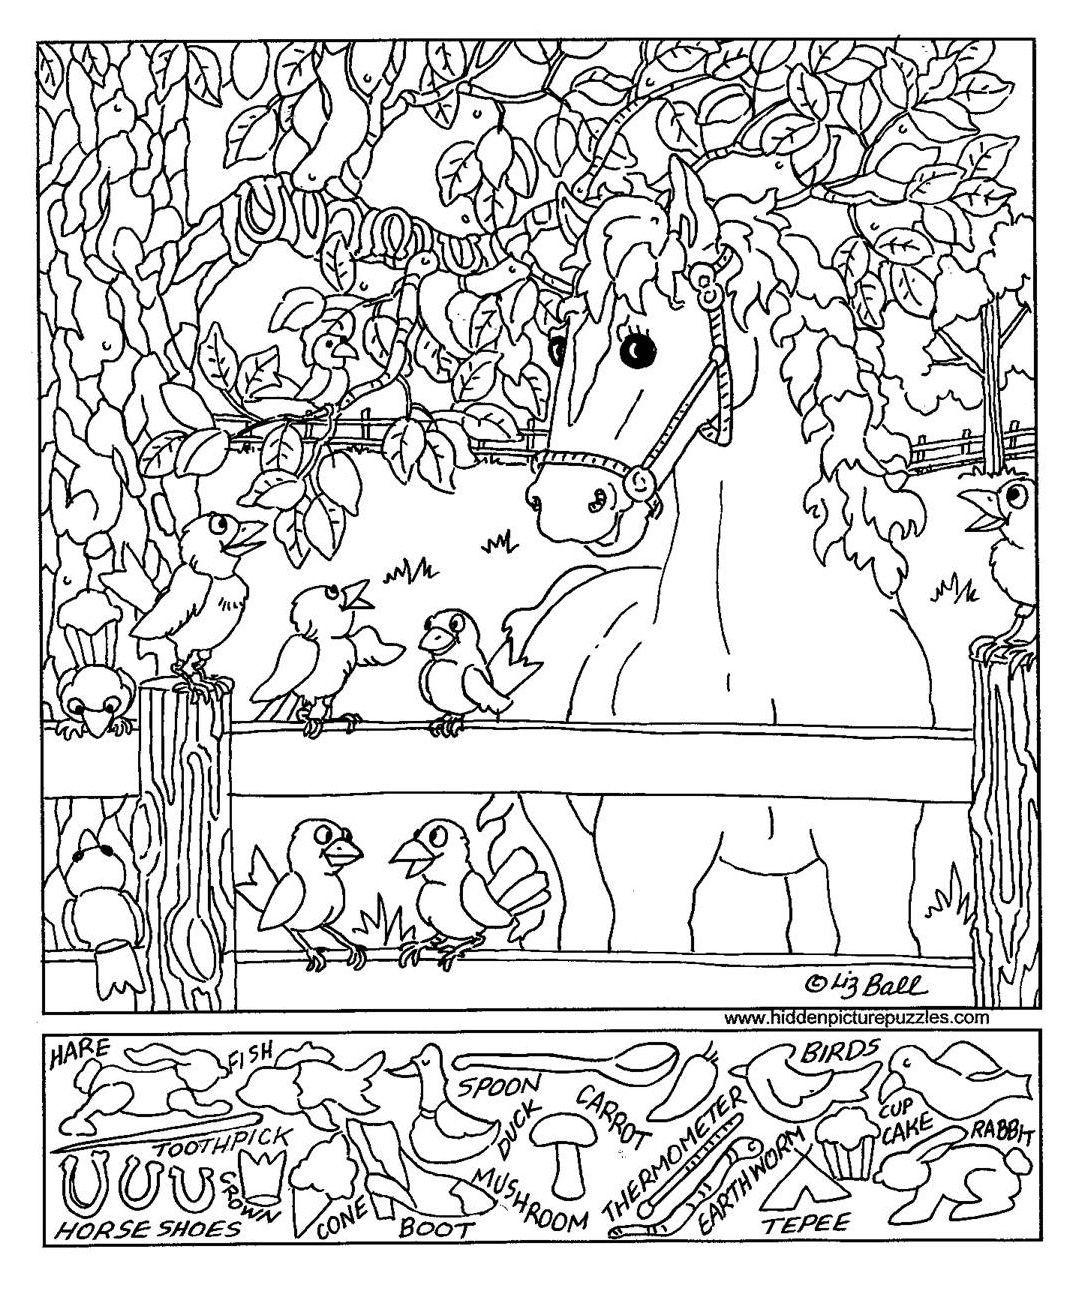 Image result for hidden pictures art class pinterest hidden